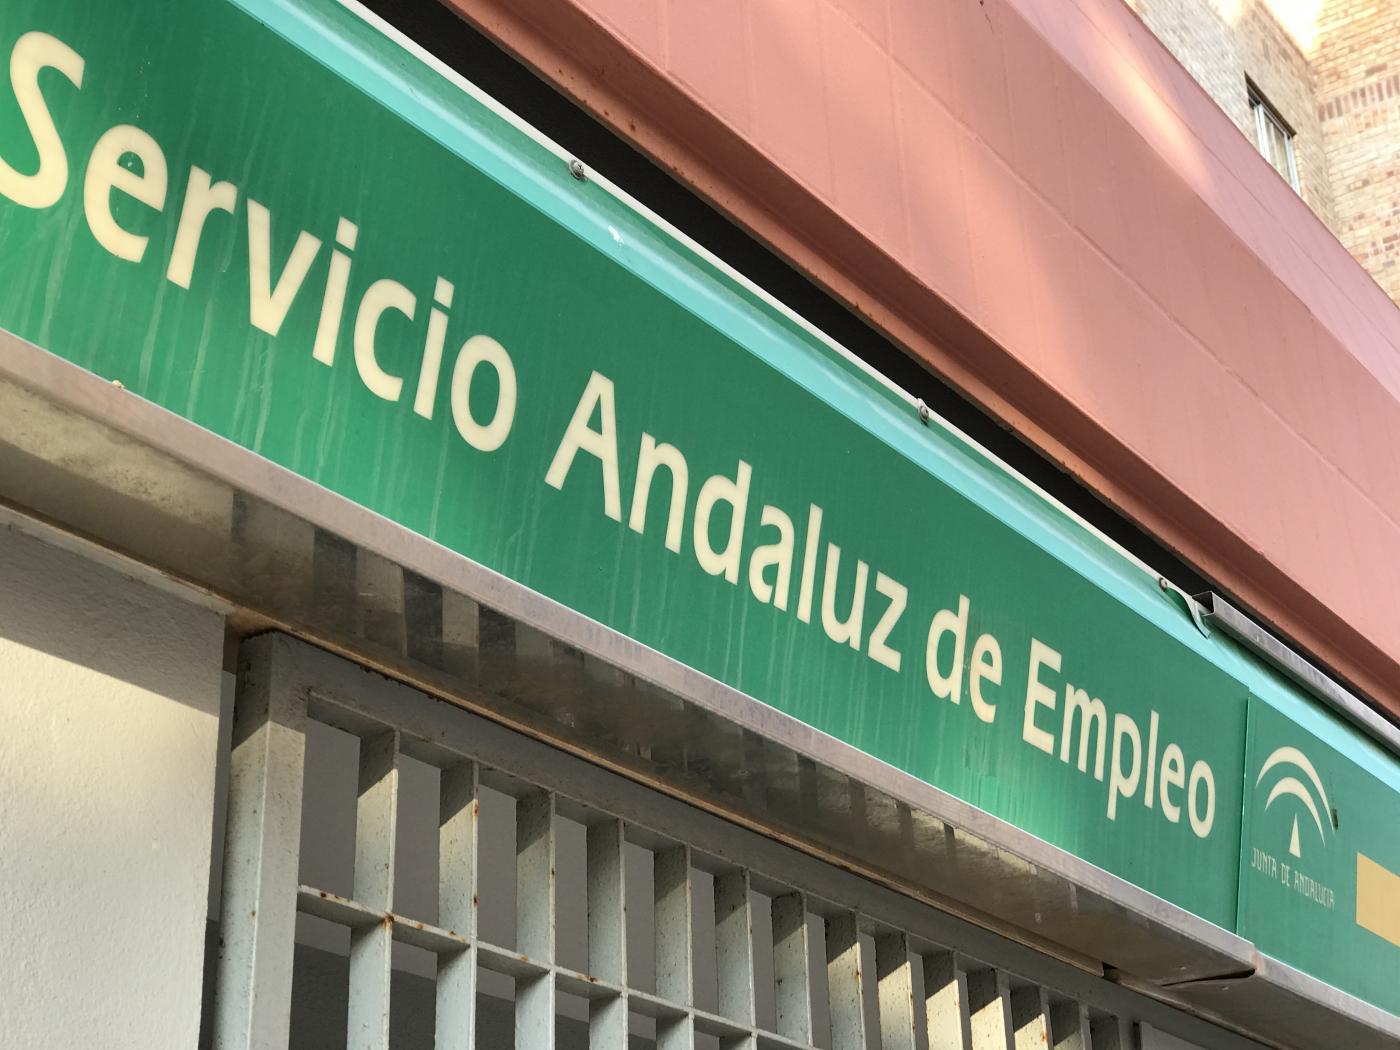 SAE ha renovado automáticamente más de un millón demandas empleo en  pandemia | Andalucía Información. Todas las noticias de Andalucía